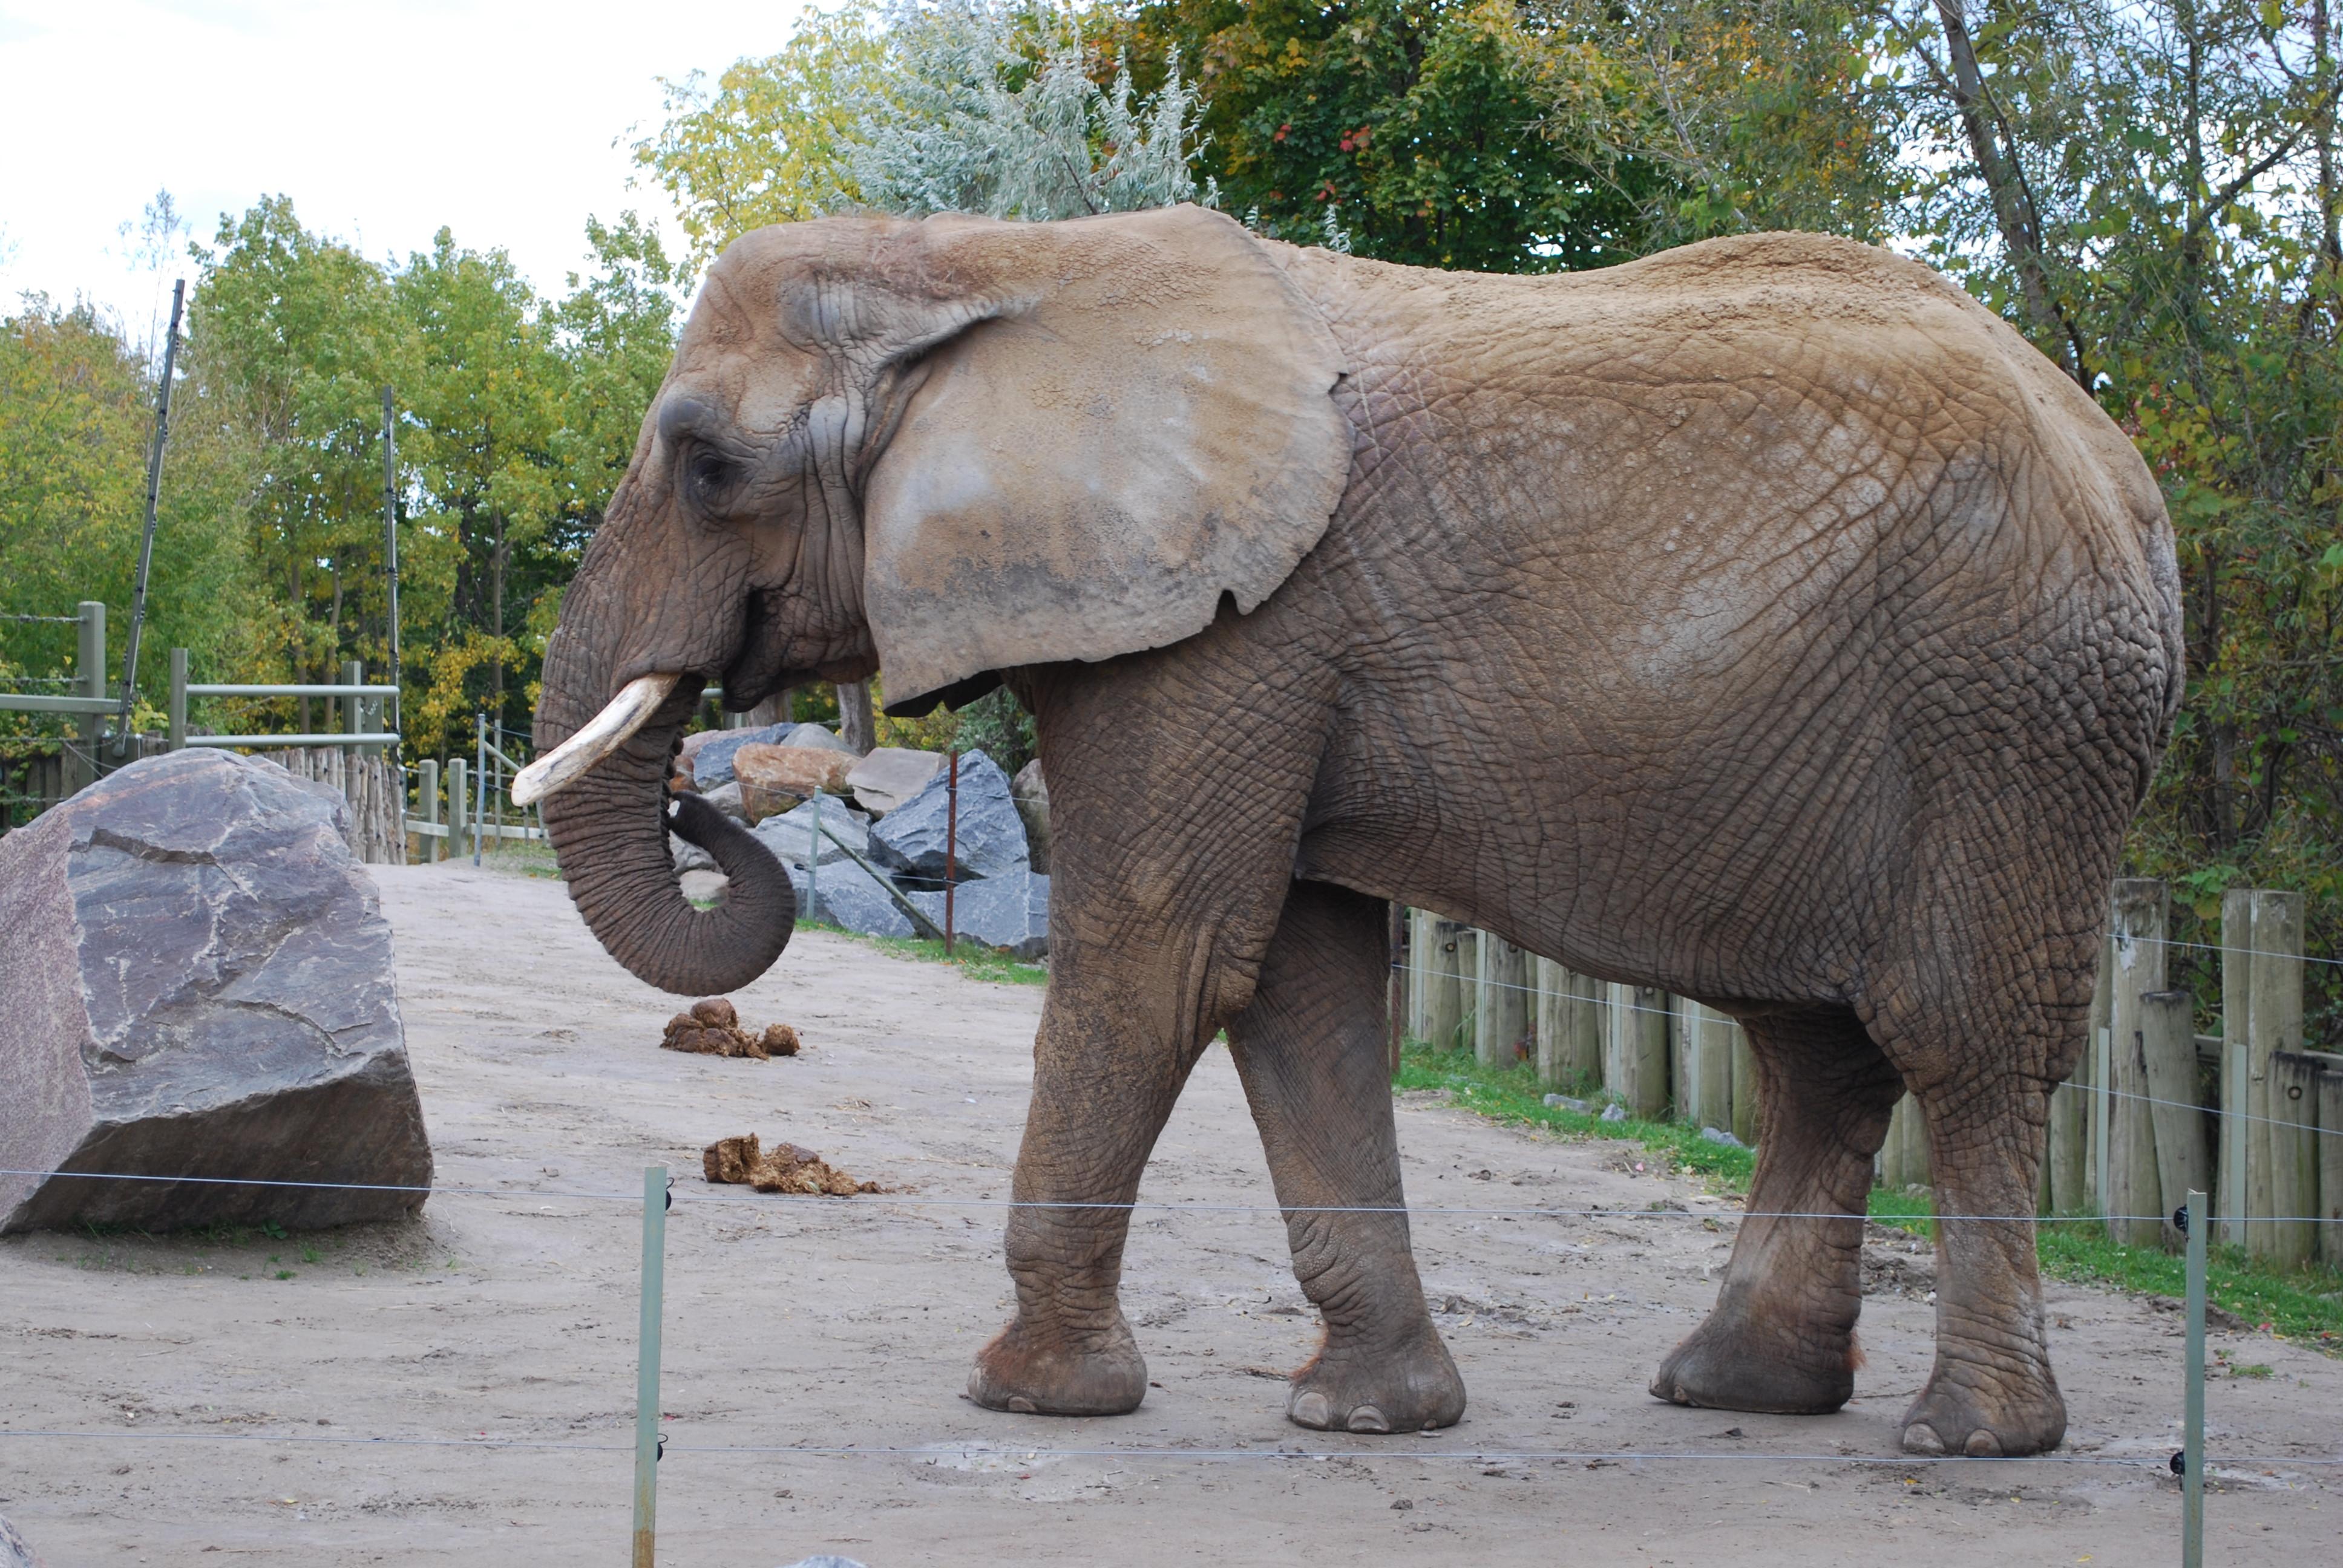 An elephant at the Toronto Zoo.